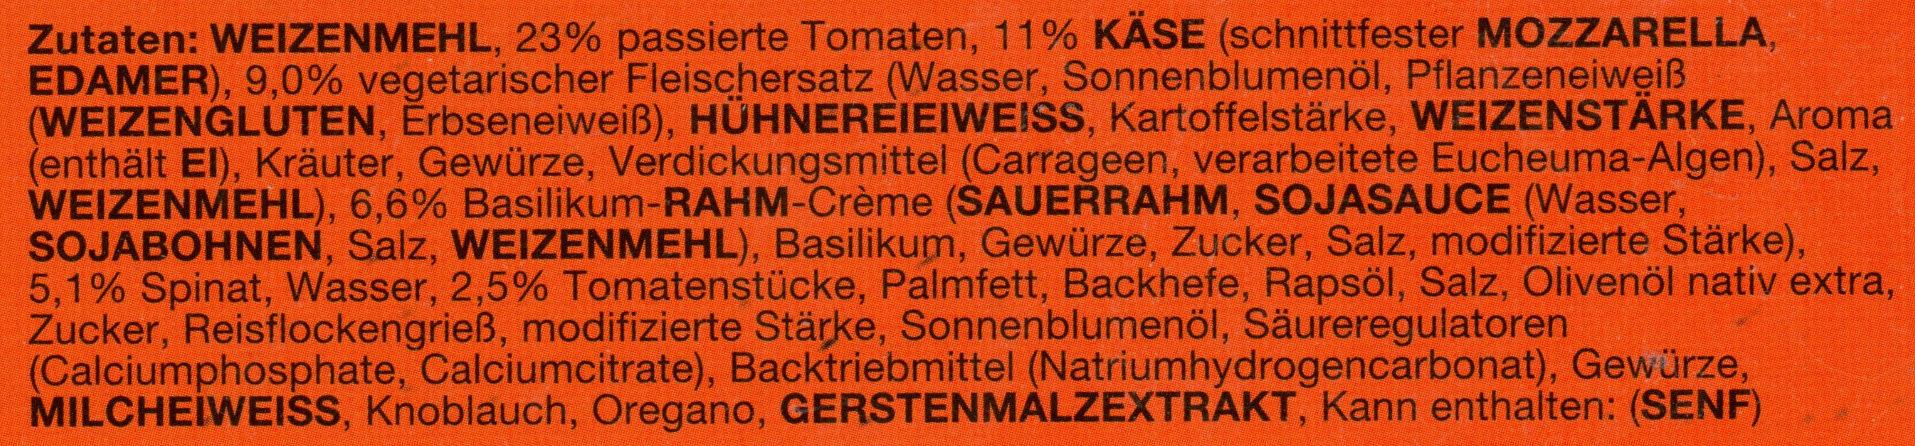 Veggie Pizza Die Zarte - Ingredients